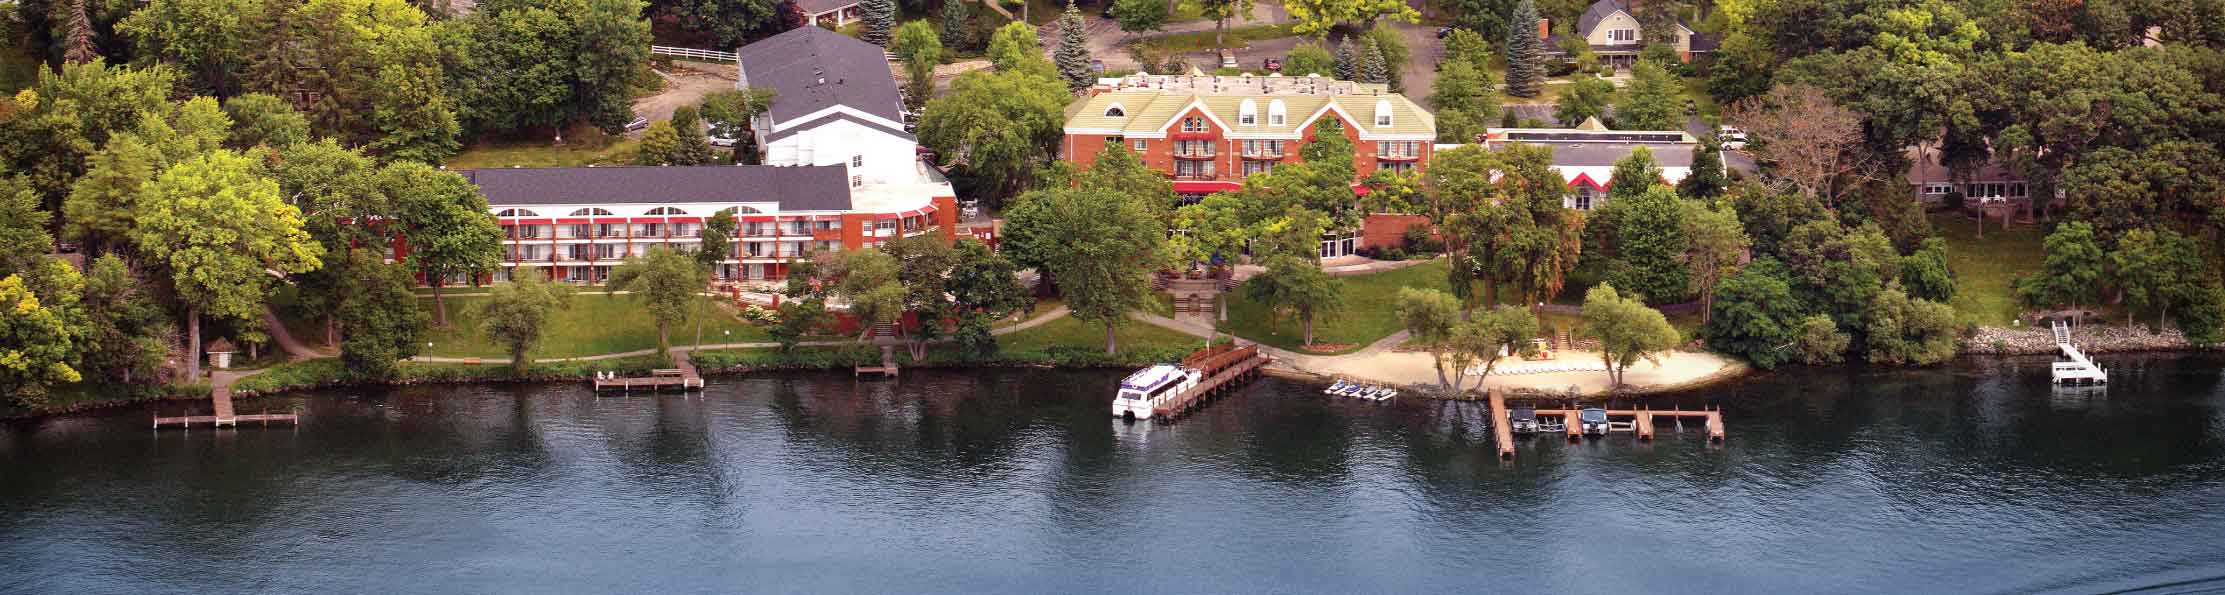 Green Lake WI Resorts - Spa Resorts Wisconsin | Heidel House